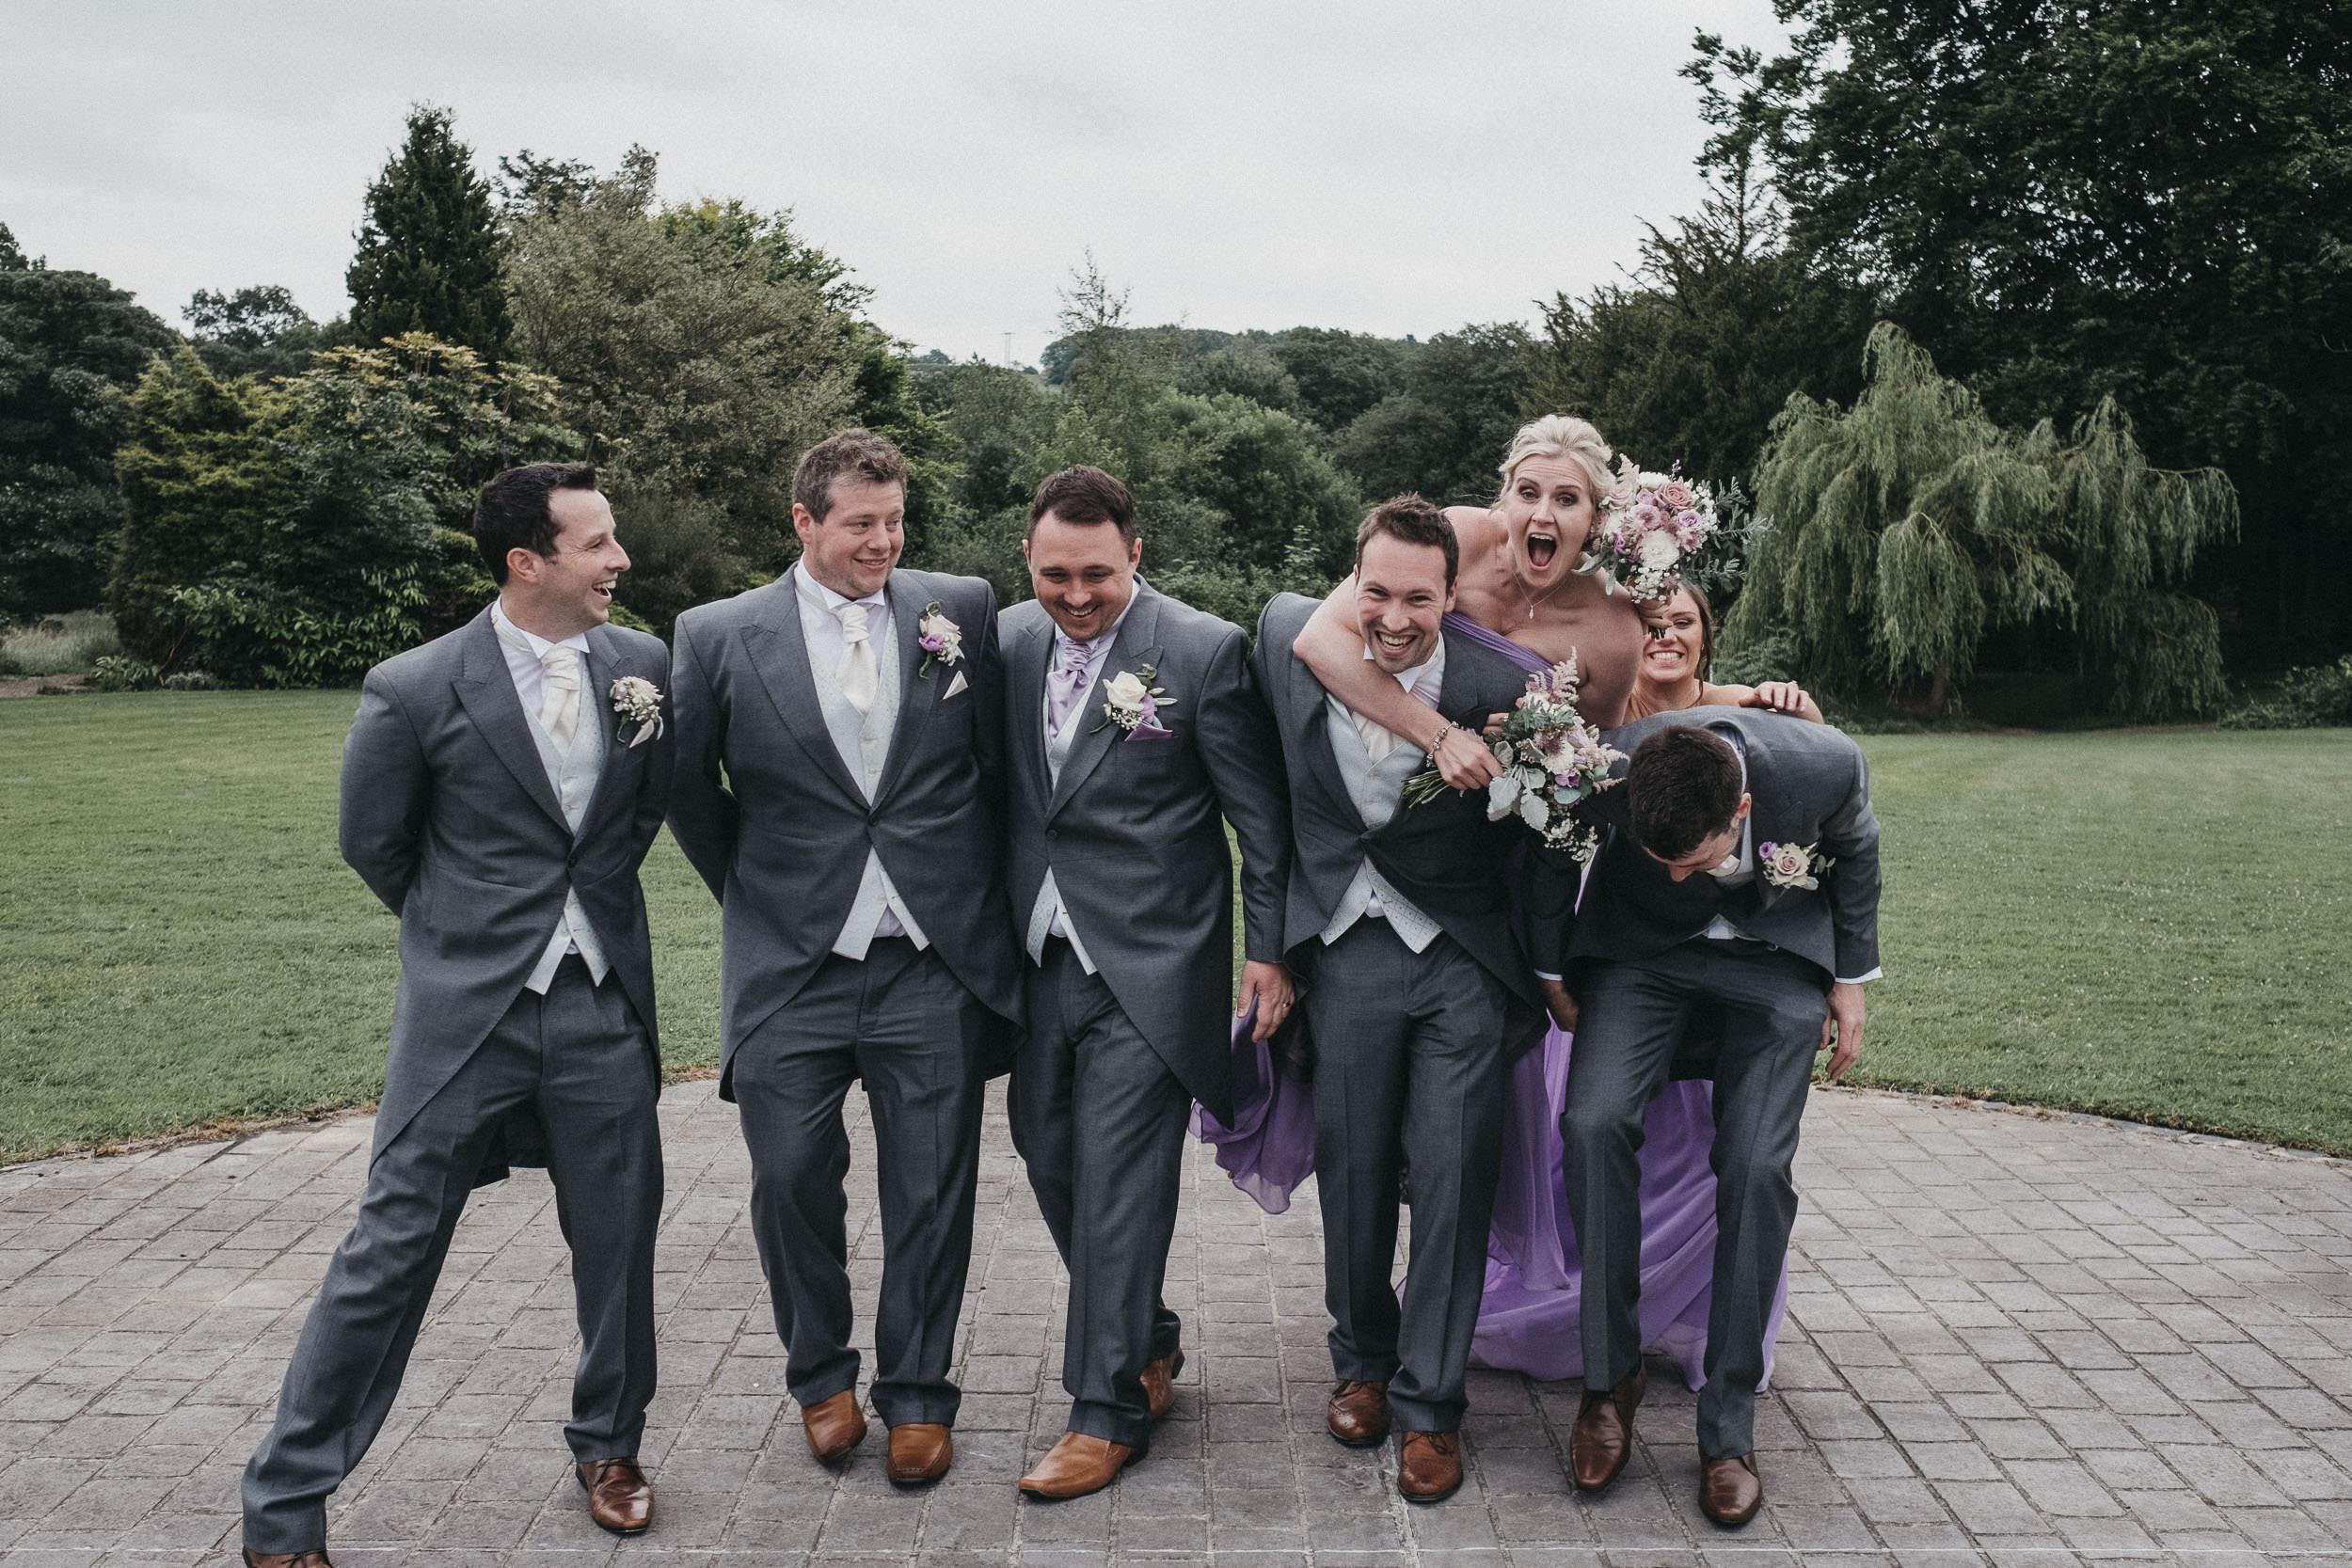 Bridesmaids photobomb the groomsmen group photo